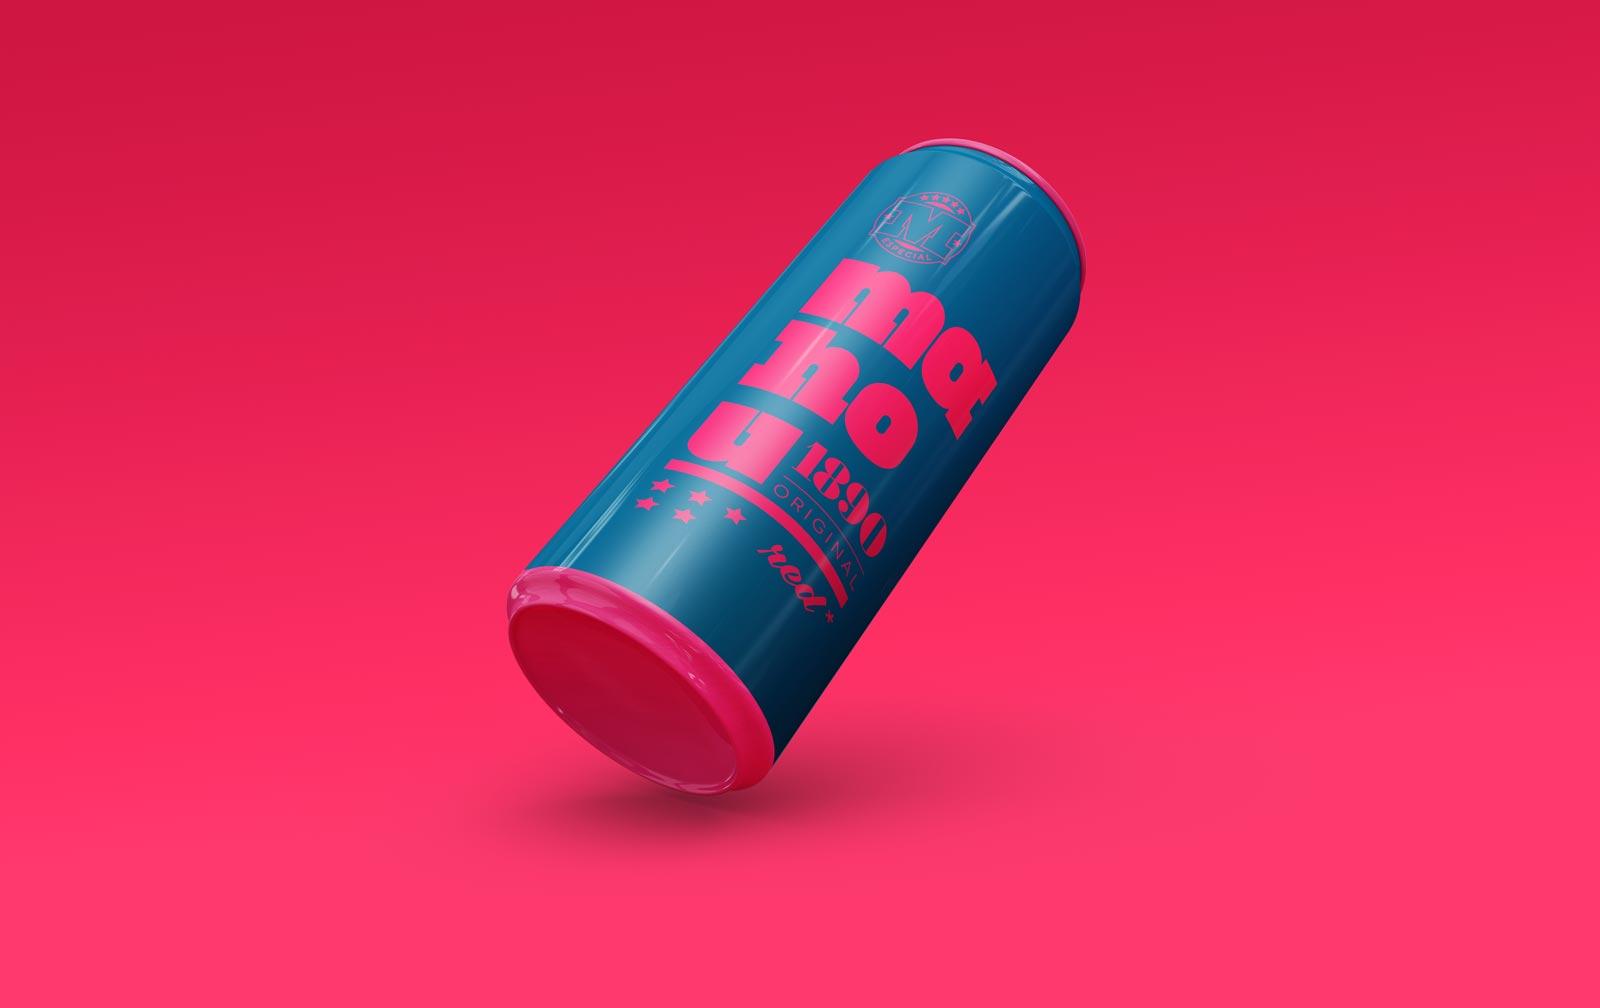 Mahou-Packaging-06